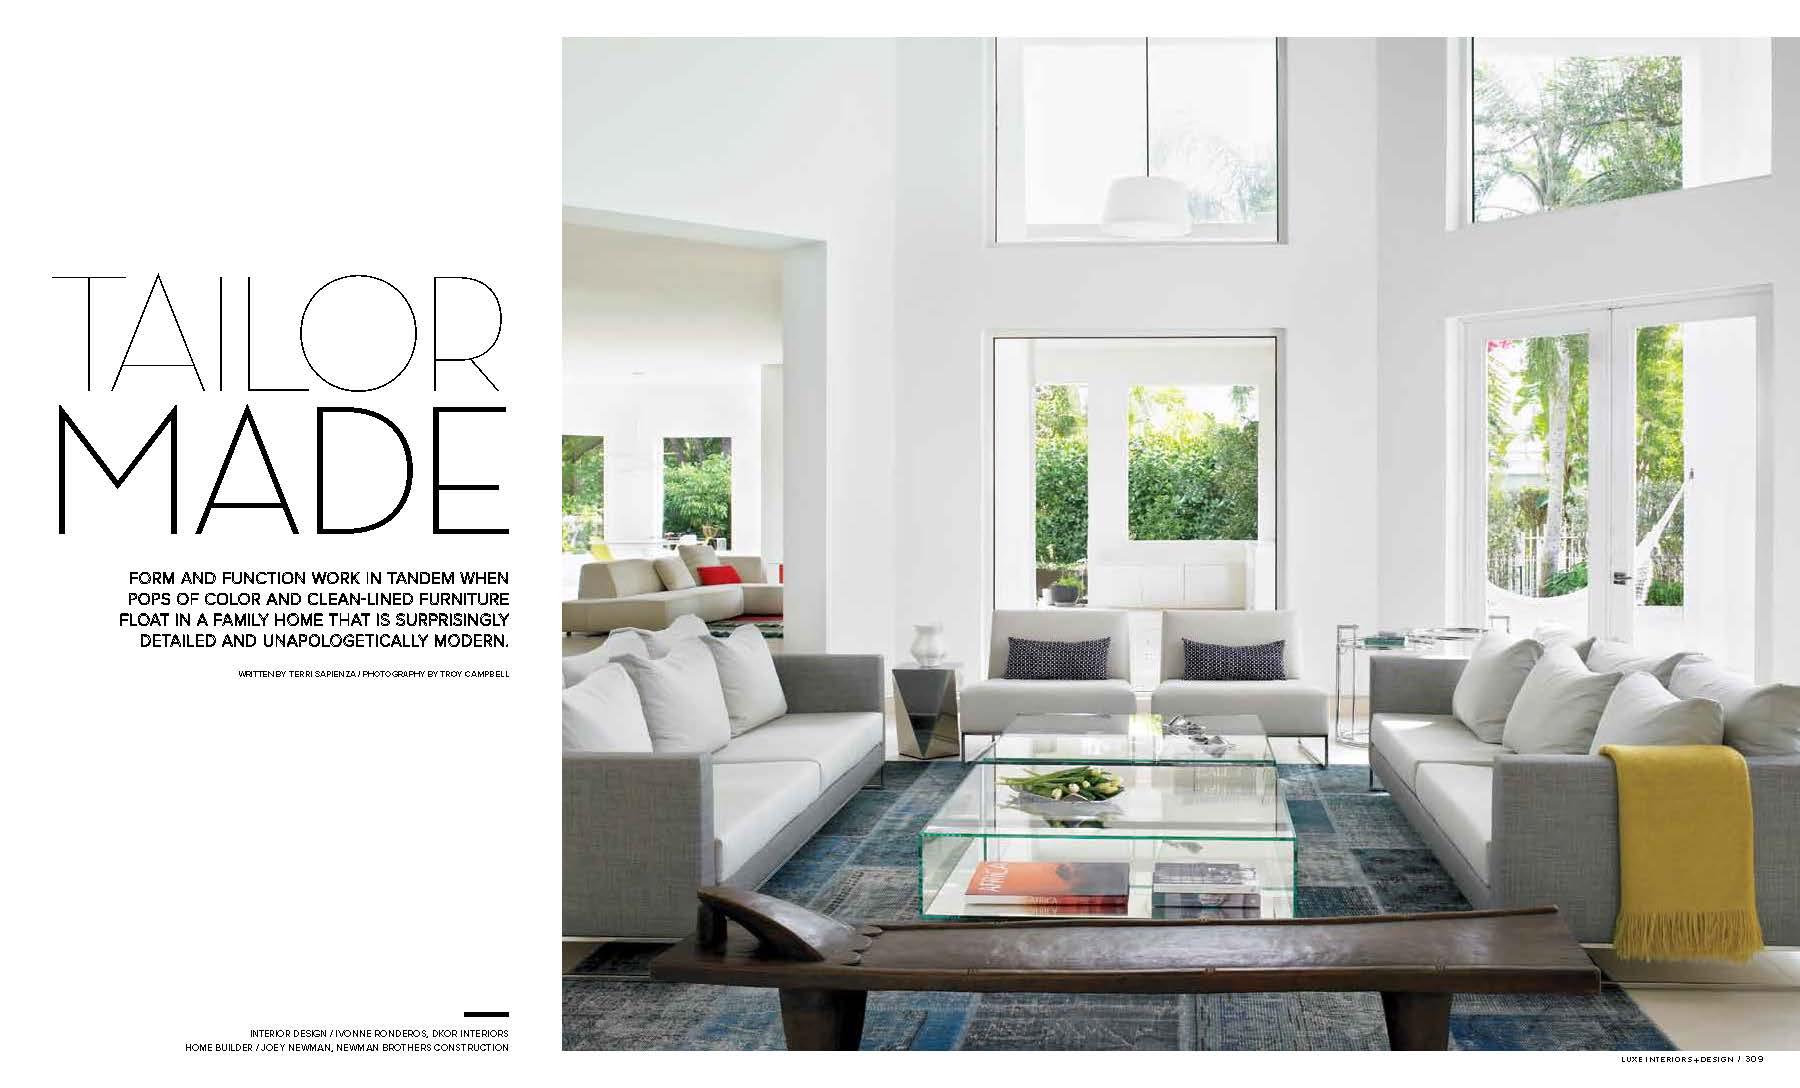 Luxe Magazine Features DKOR  INTERIOR DESIGN PRESS - Luxe home interiors